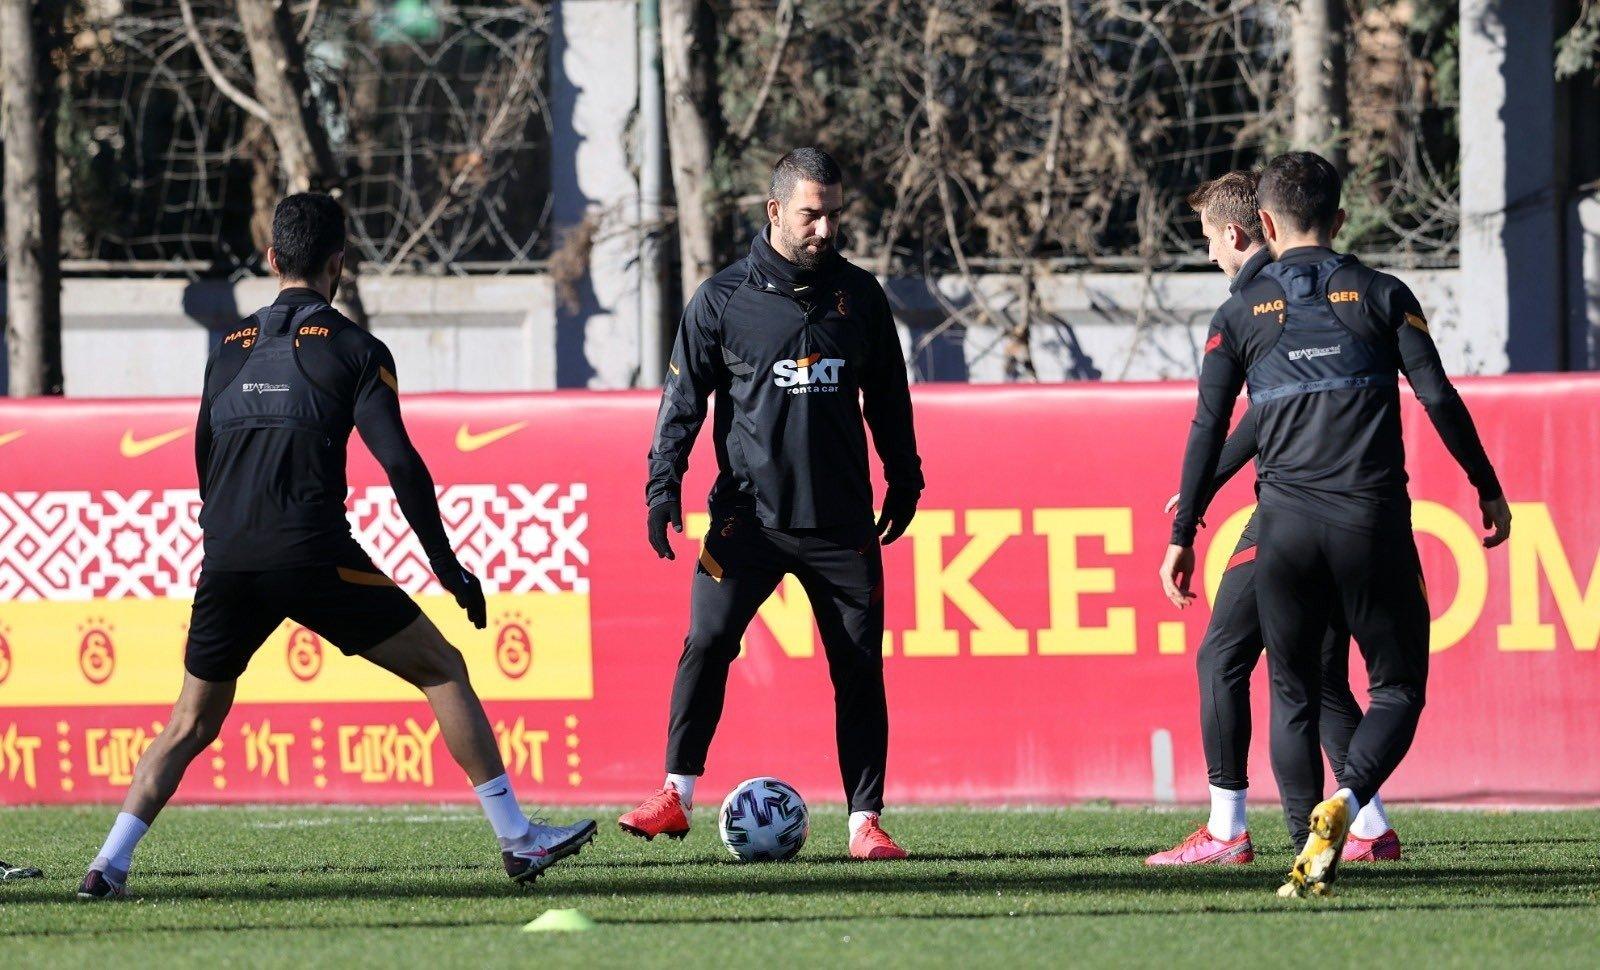 Galatasaray's Arda Turan (C) trains with teammates ahead of Tuesday's Süper Lig match against Başakşehir, Istanbul, Turkey, Feb. 1, 2021.